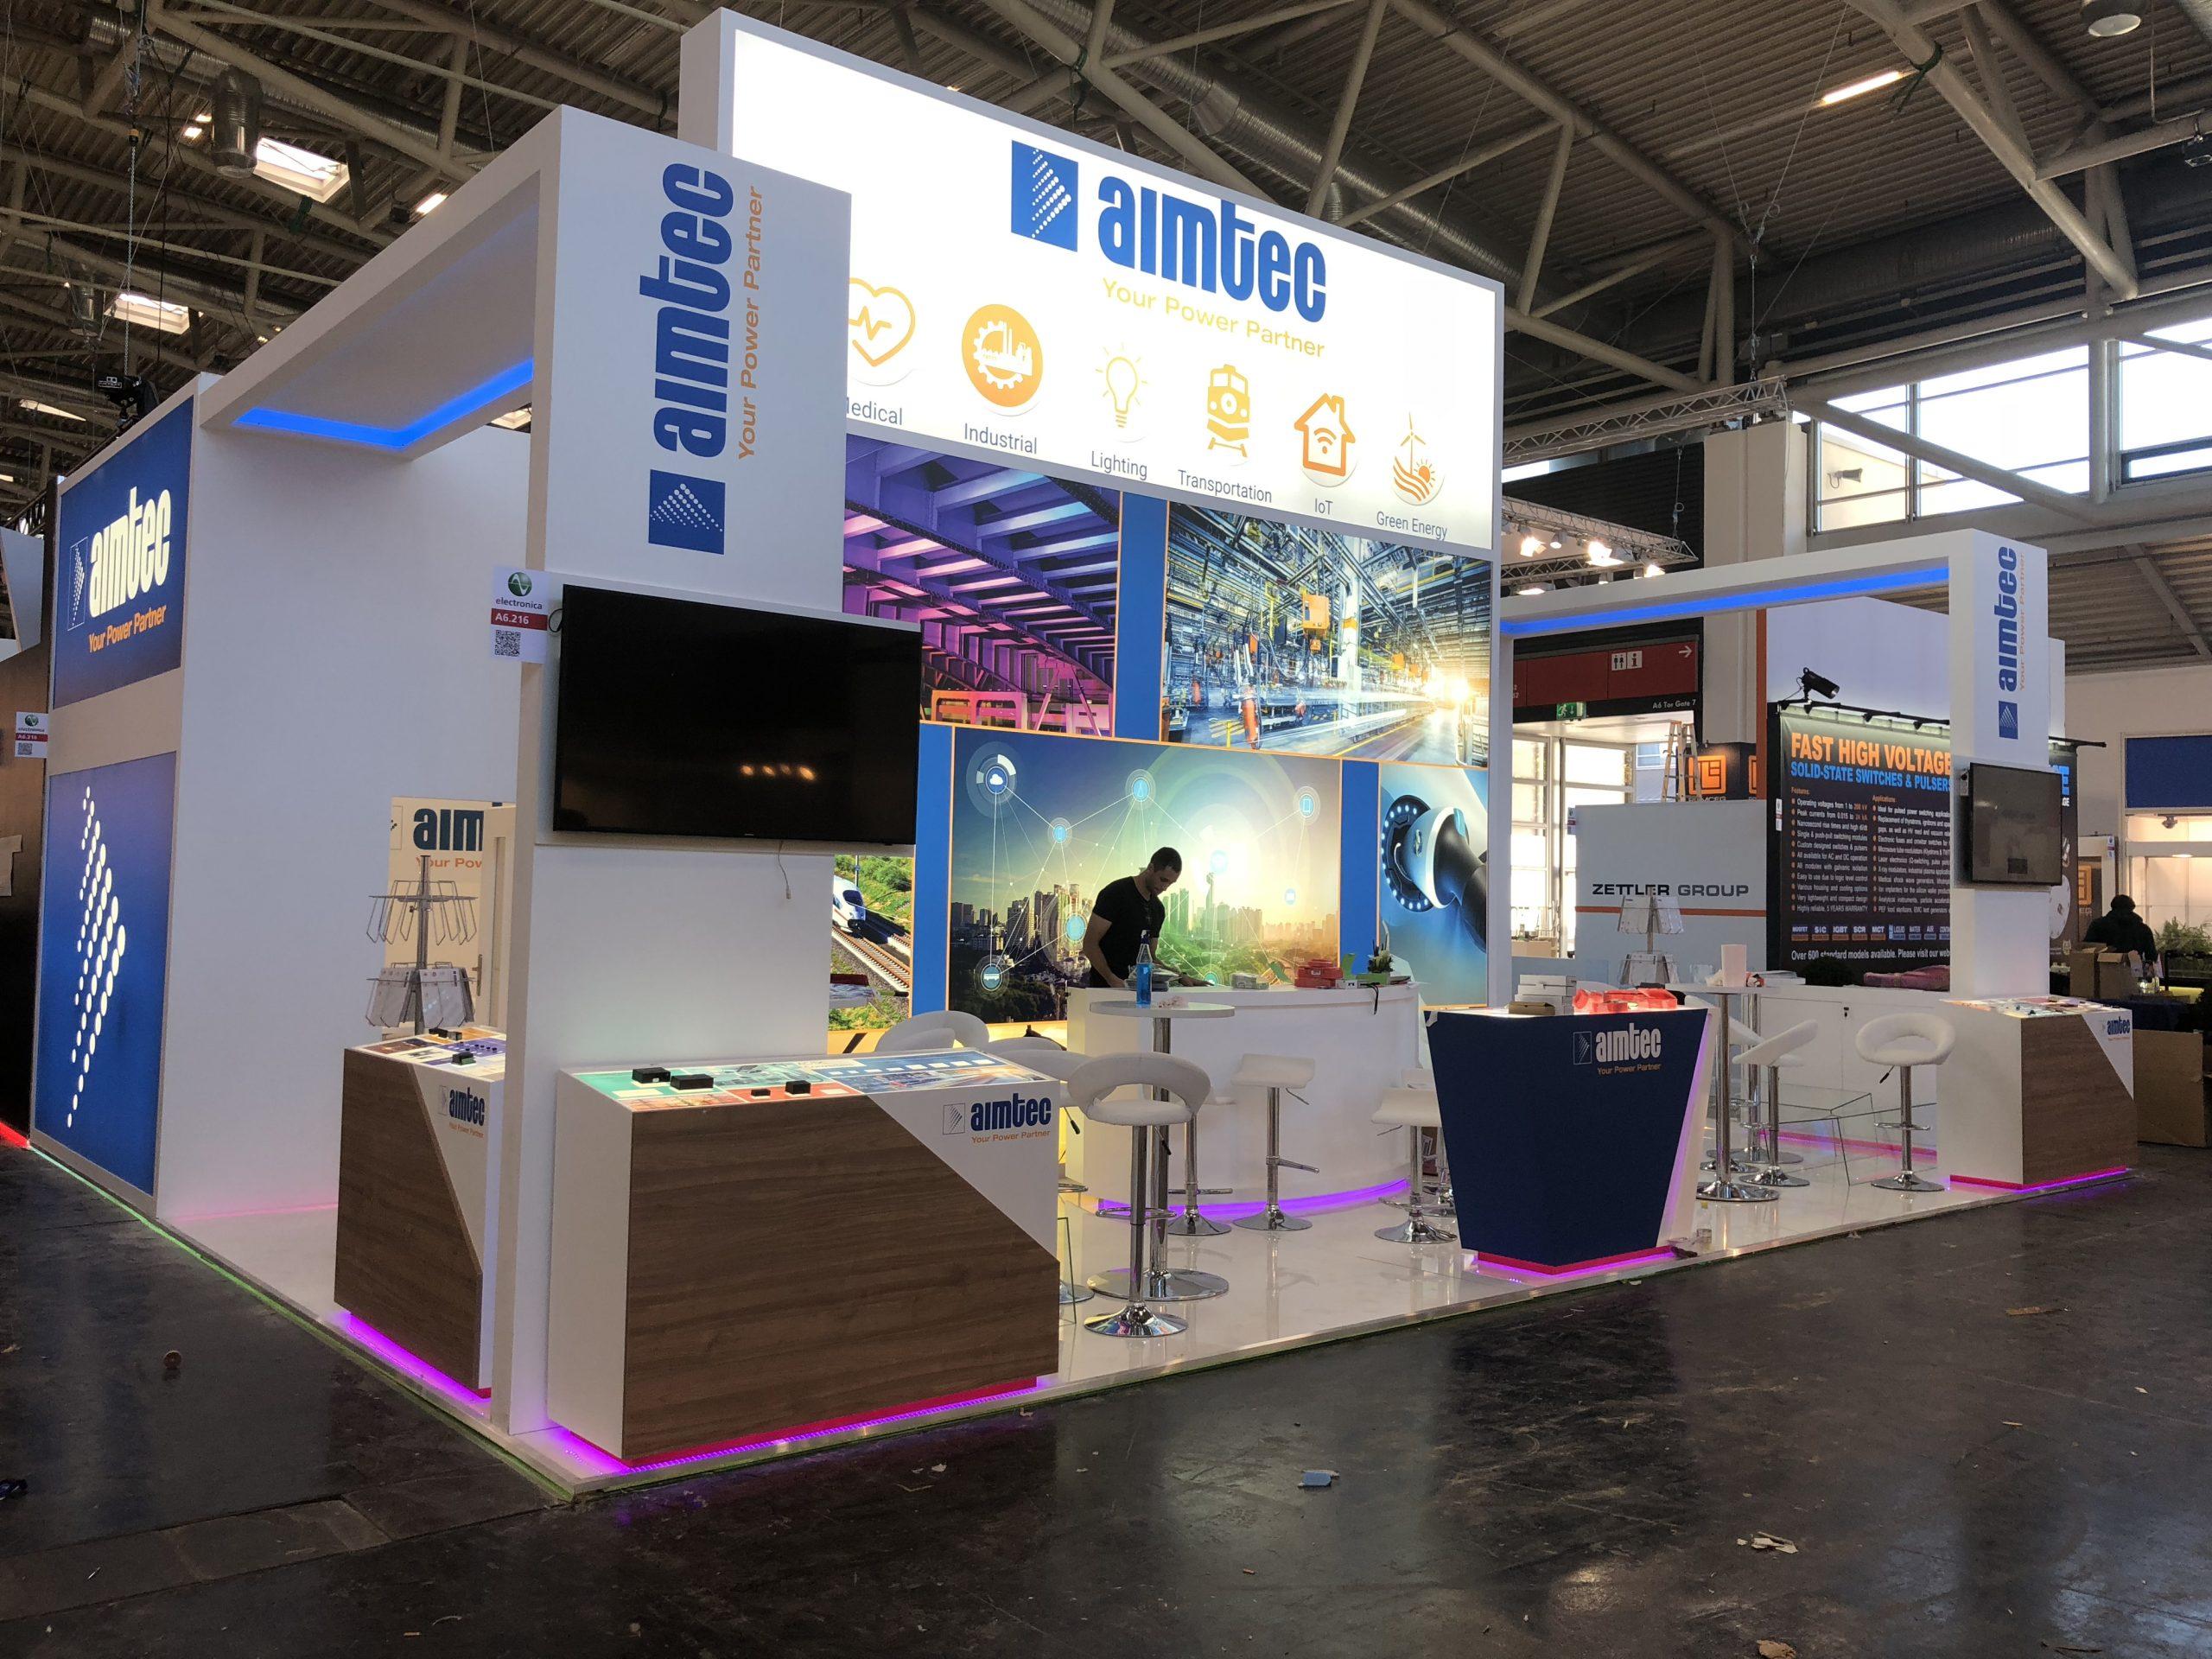 Exhibition Stand Builder in Berlin